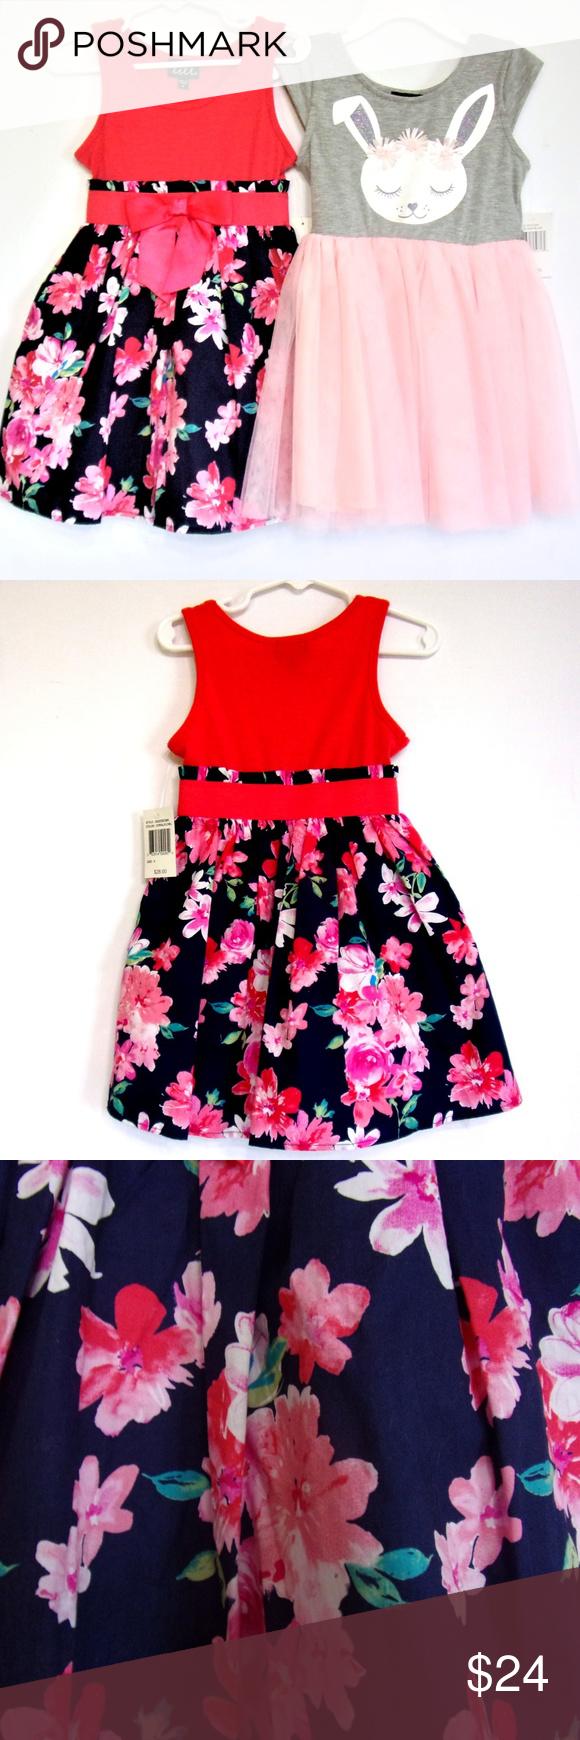 Toddler Girl Lilt Dresses Bundle Nwt Size 4t Pinks Light Pink Dress Dresses Pink Dress [ 1740 x 580 Pixel ]